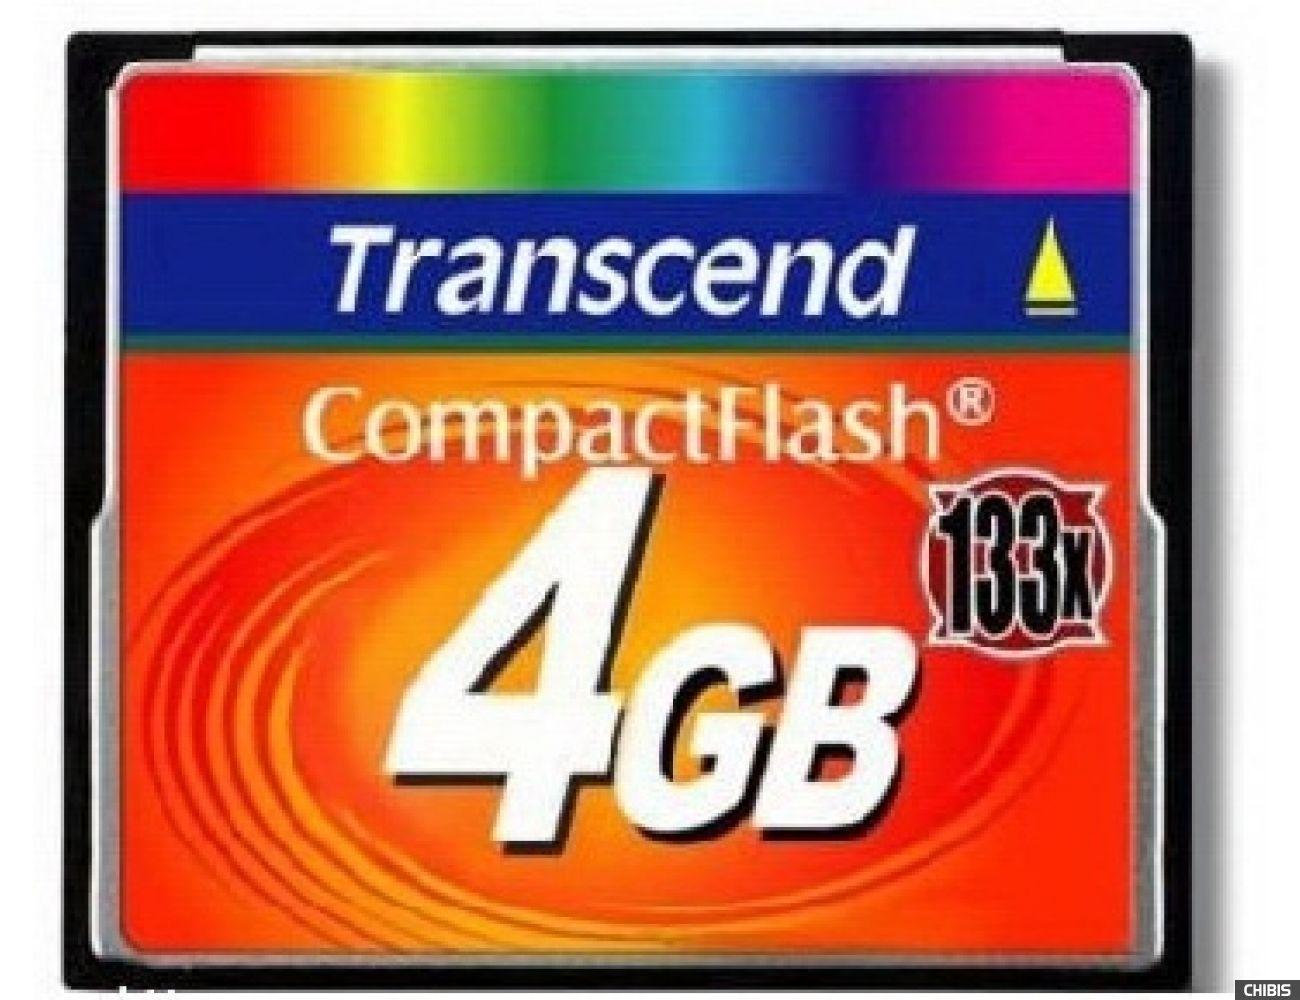 Карта памяти Transcend Compact Flash 133x 4Gb